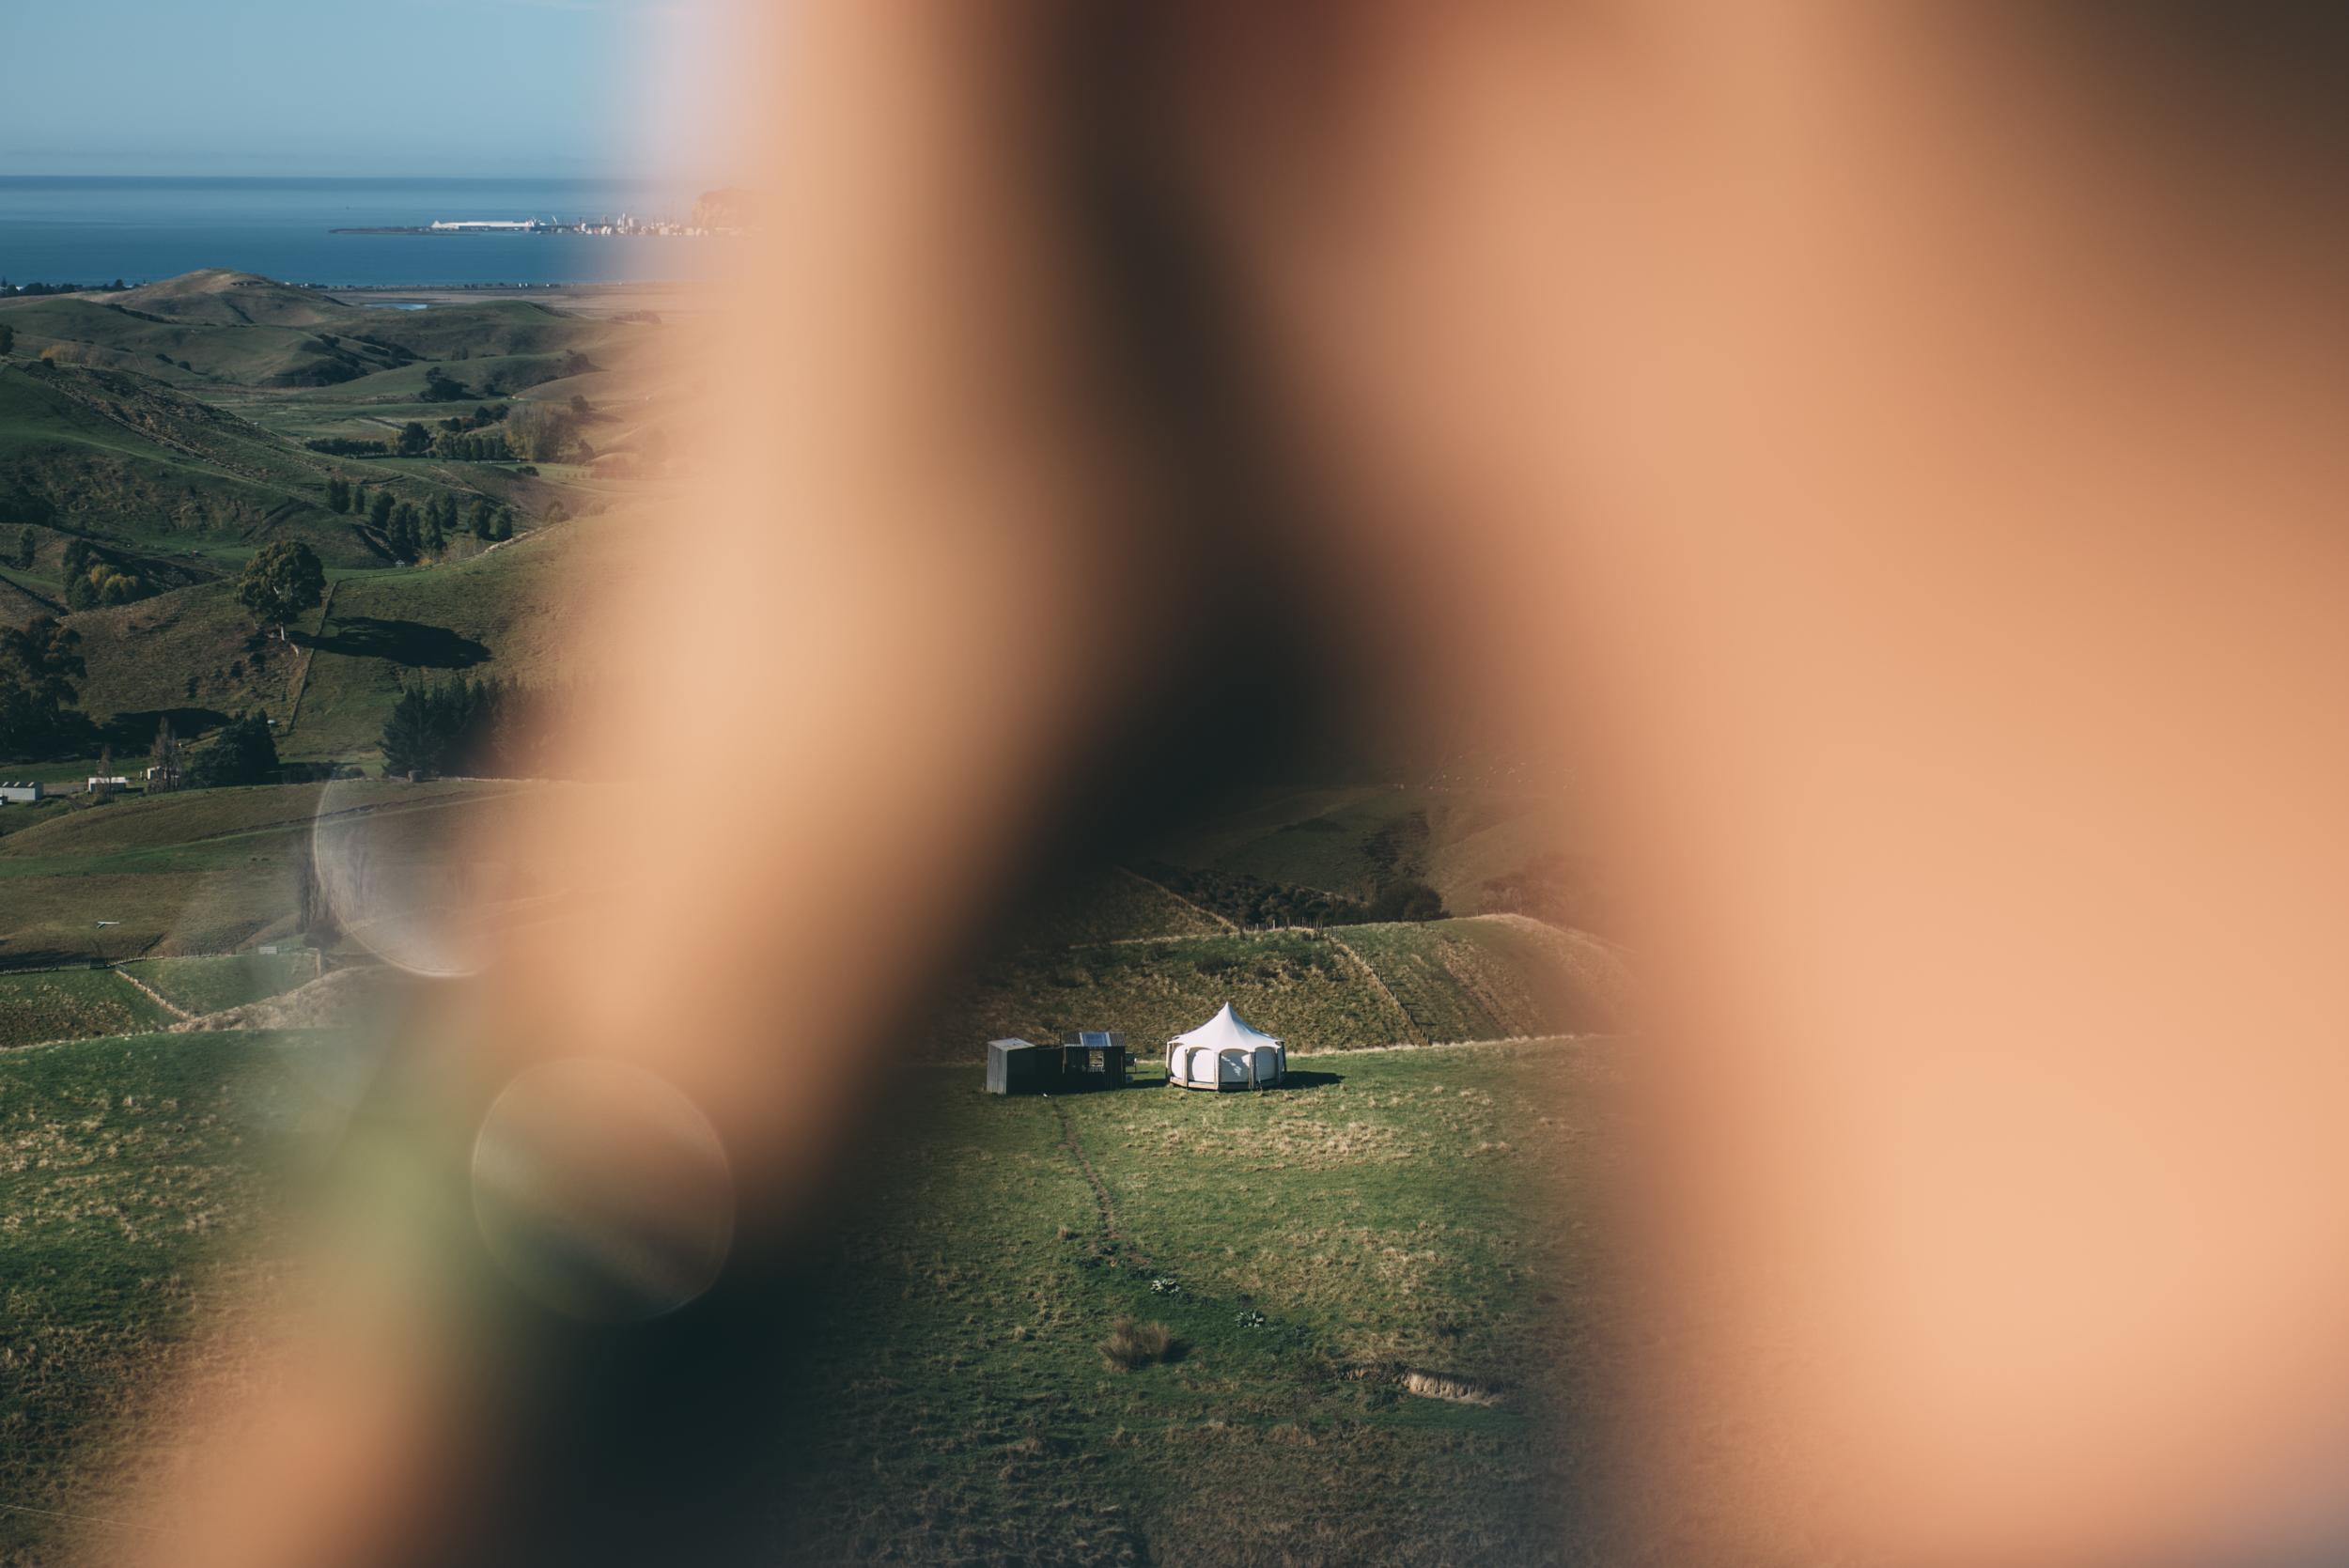 Hawkes Bay Escapes_Lola Photography_WEB_019.jpg